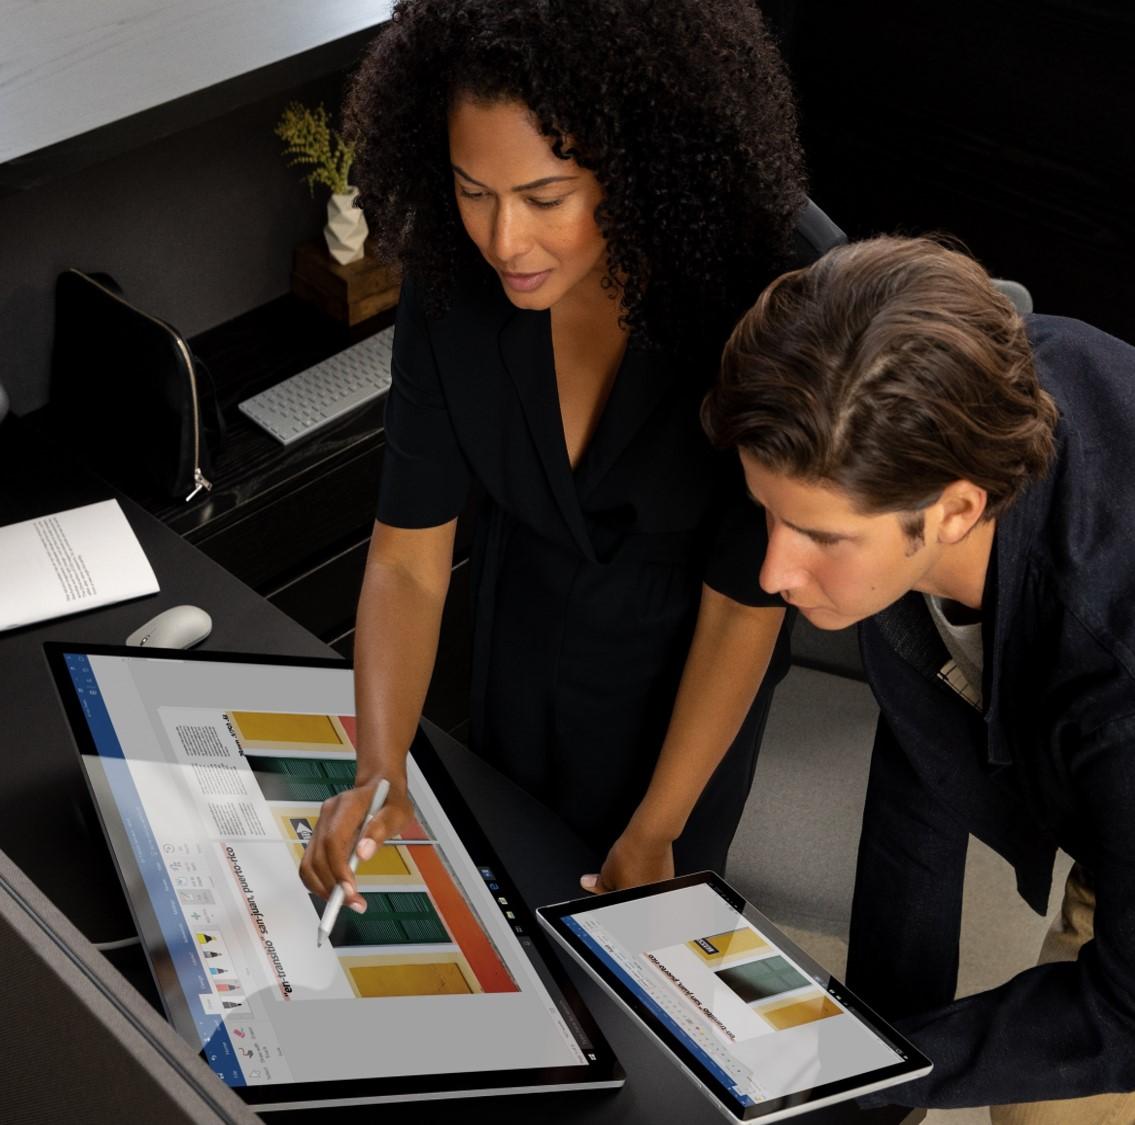 Microsoft Dynamics 365 for Customer Insights 11